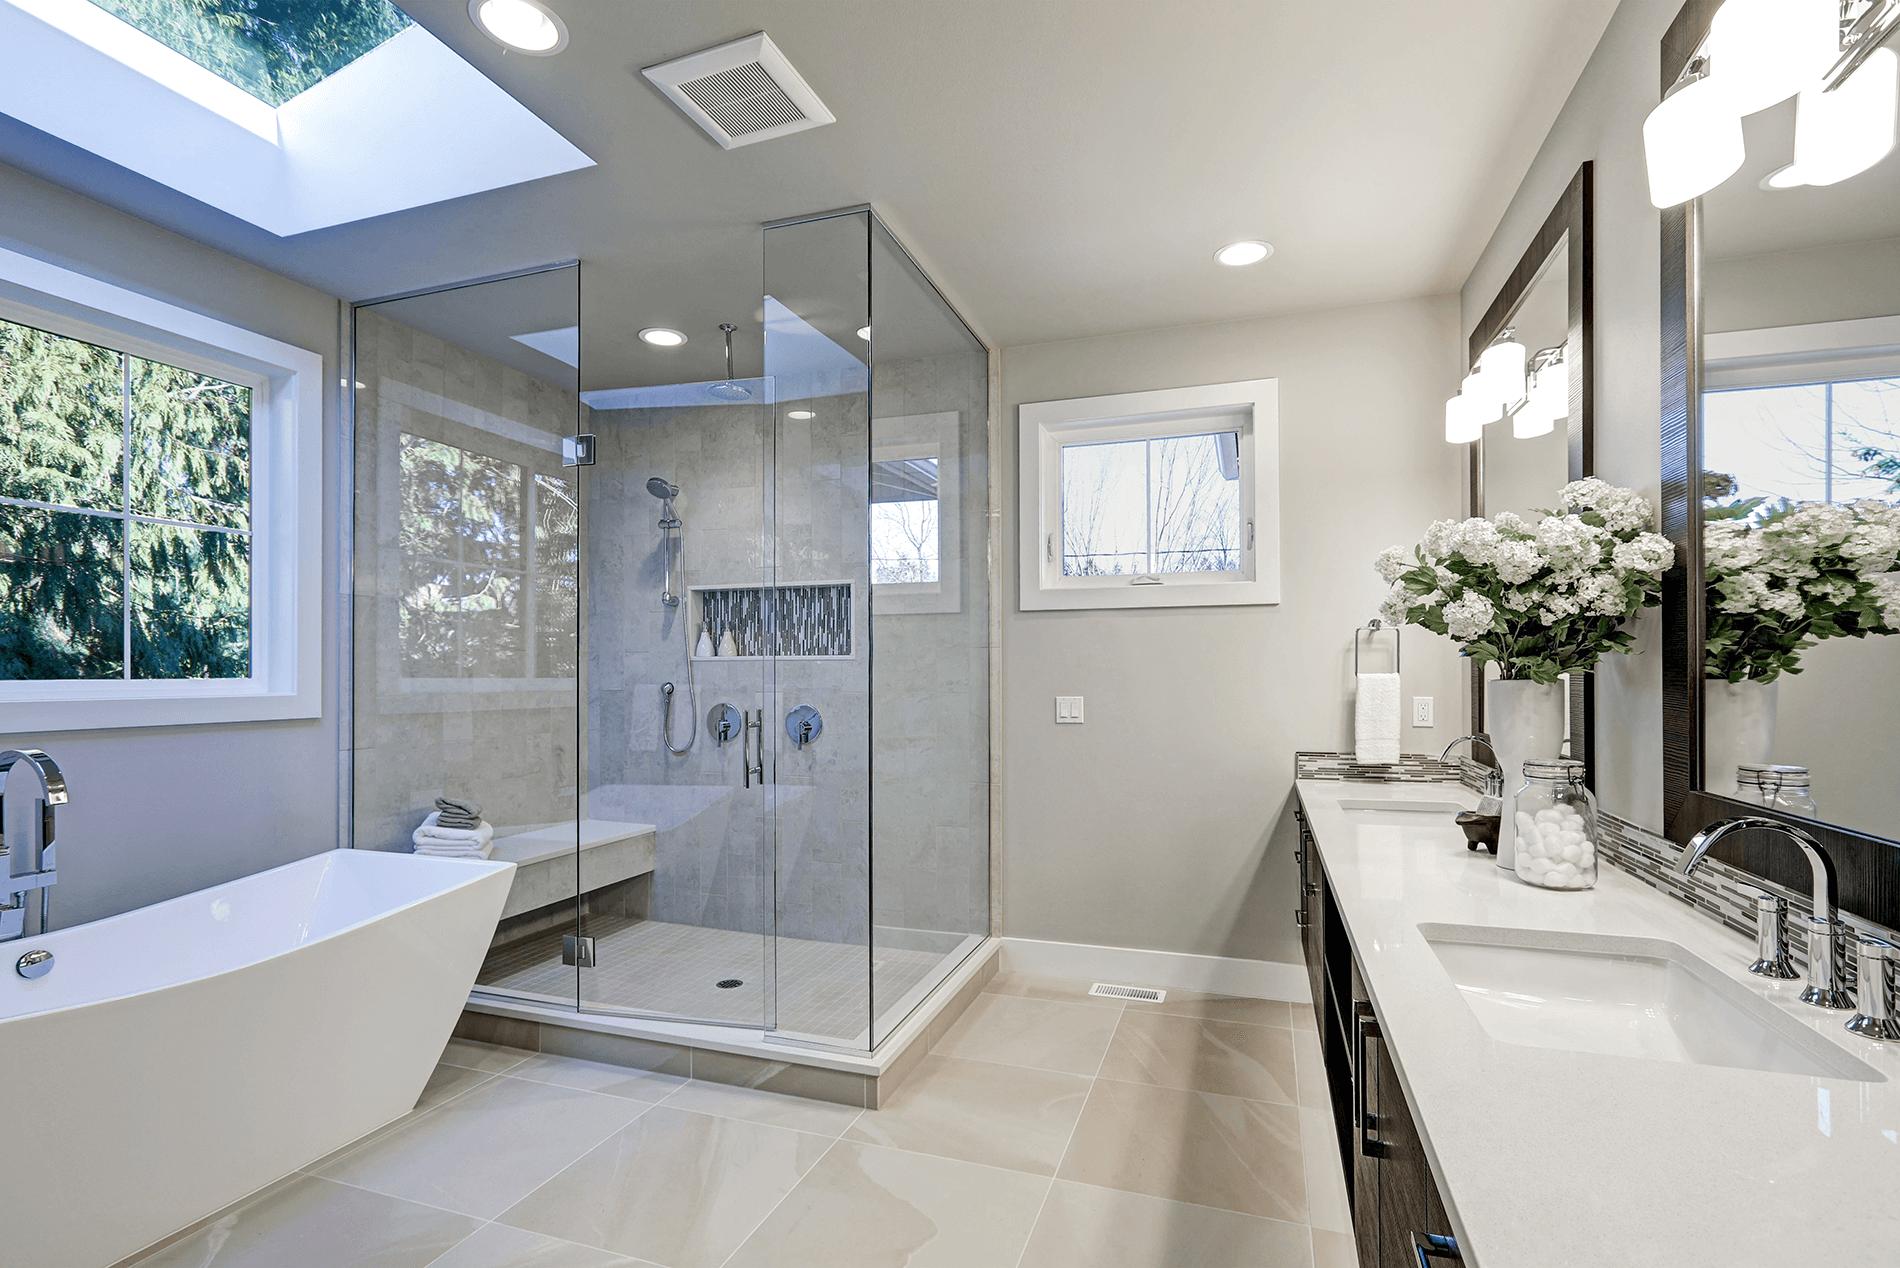 Elwood bathroom renovation cost